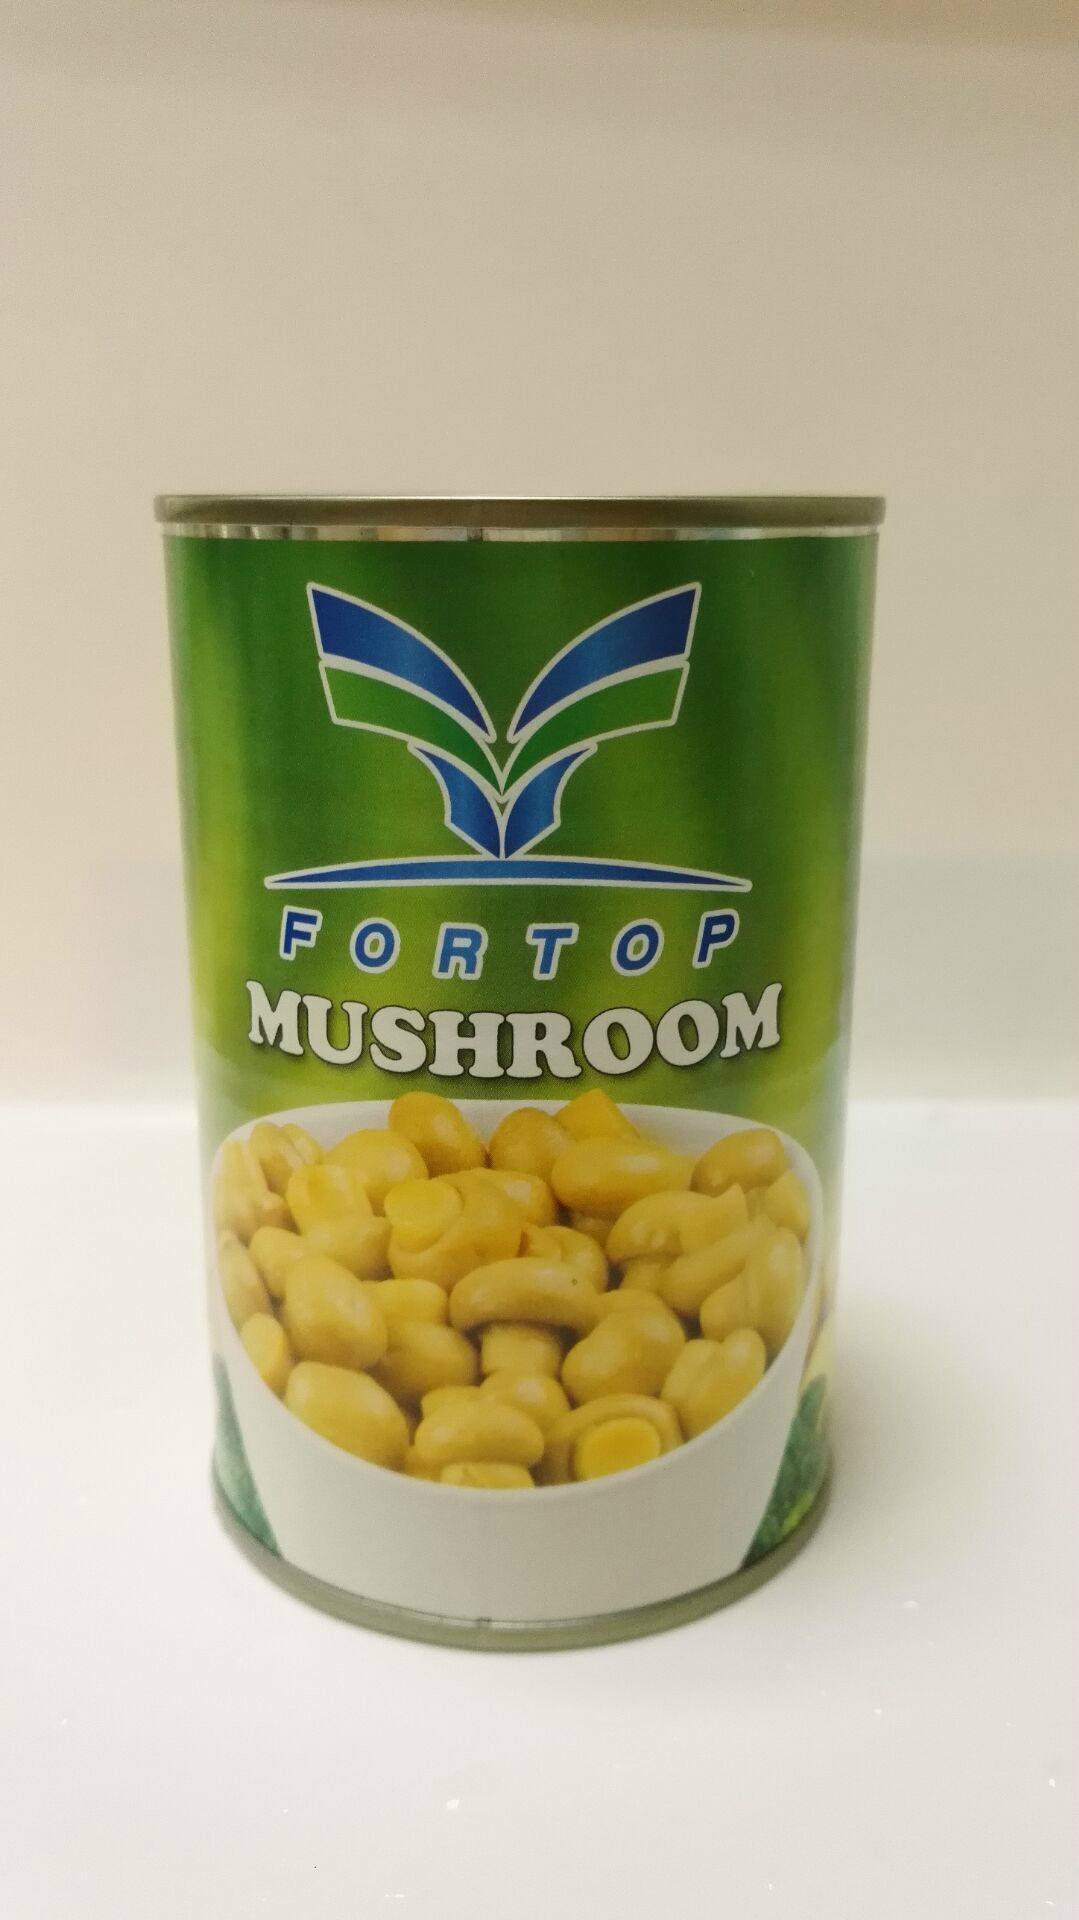 Canned Mushroom Champignons Mushroom Whole in brine 3